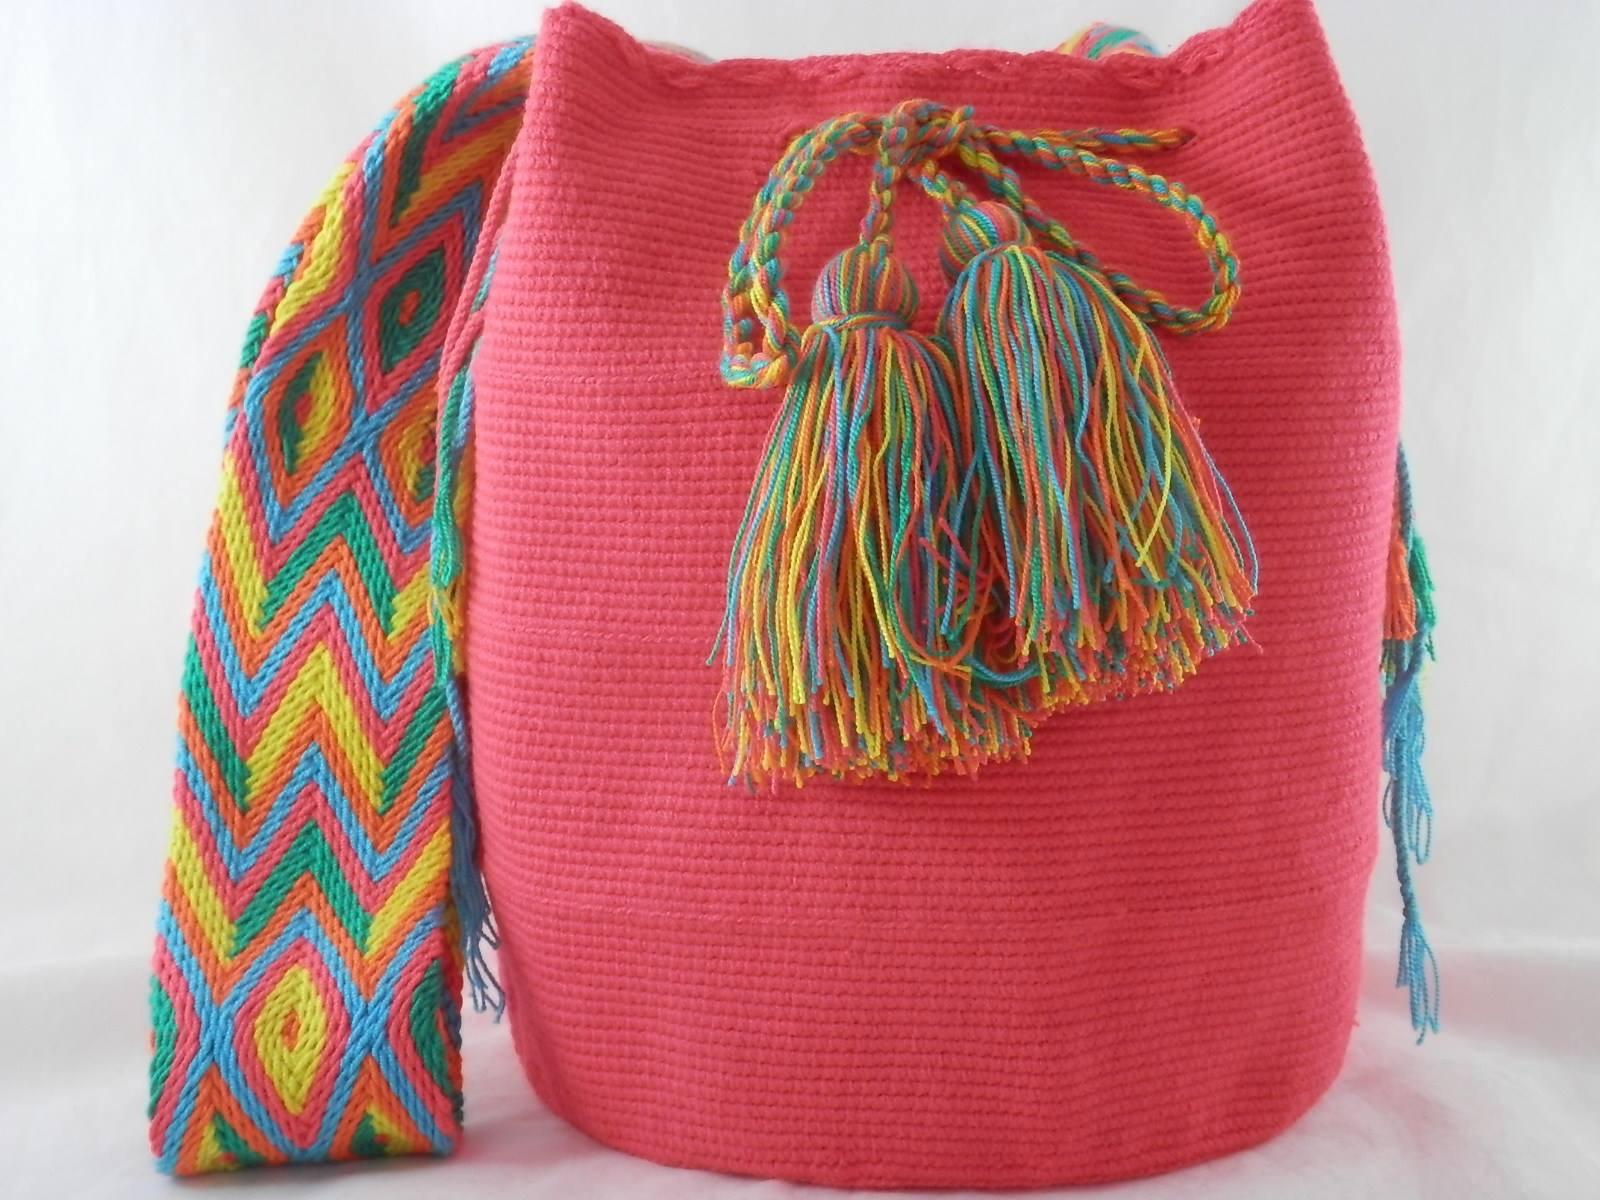 Wayuu Bag by PPS-IMG_9323